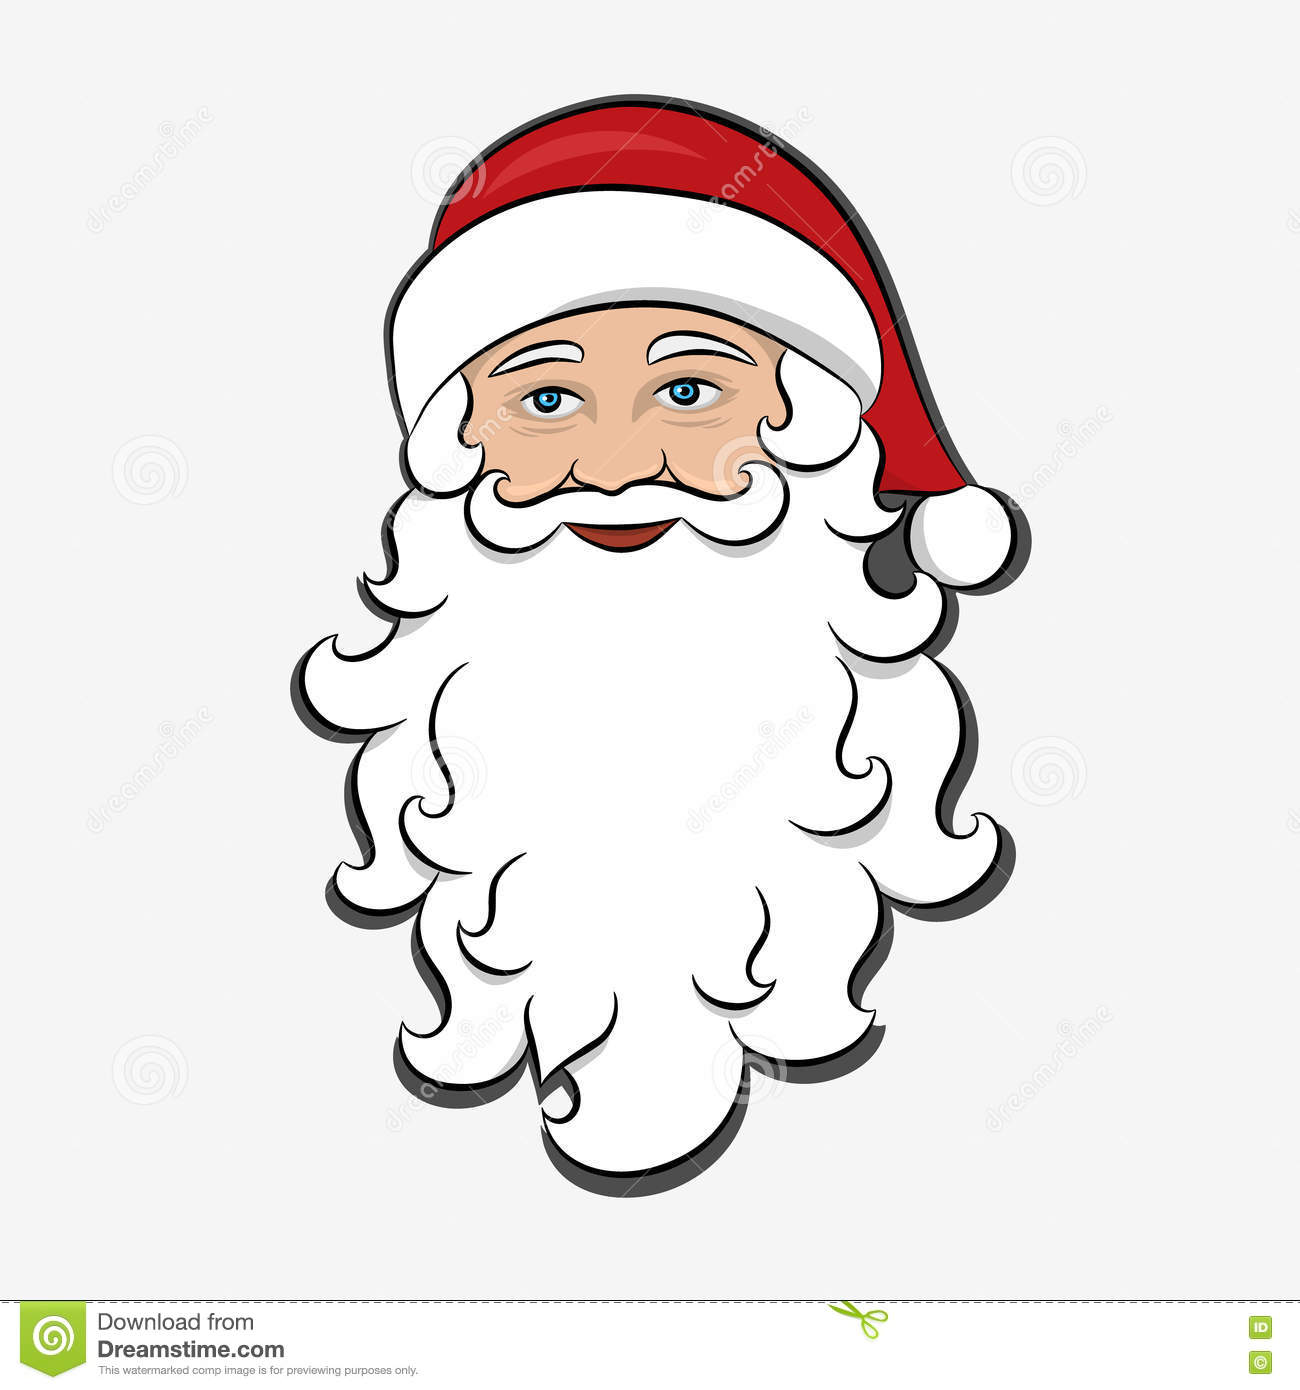 Weihnachtsmann bart clipart 6 » Clipart Station.